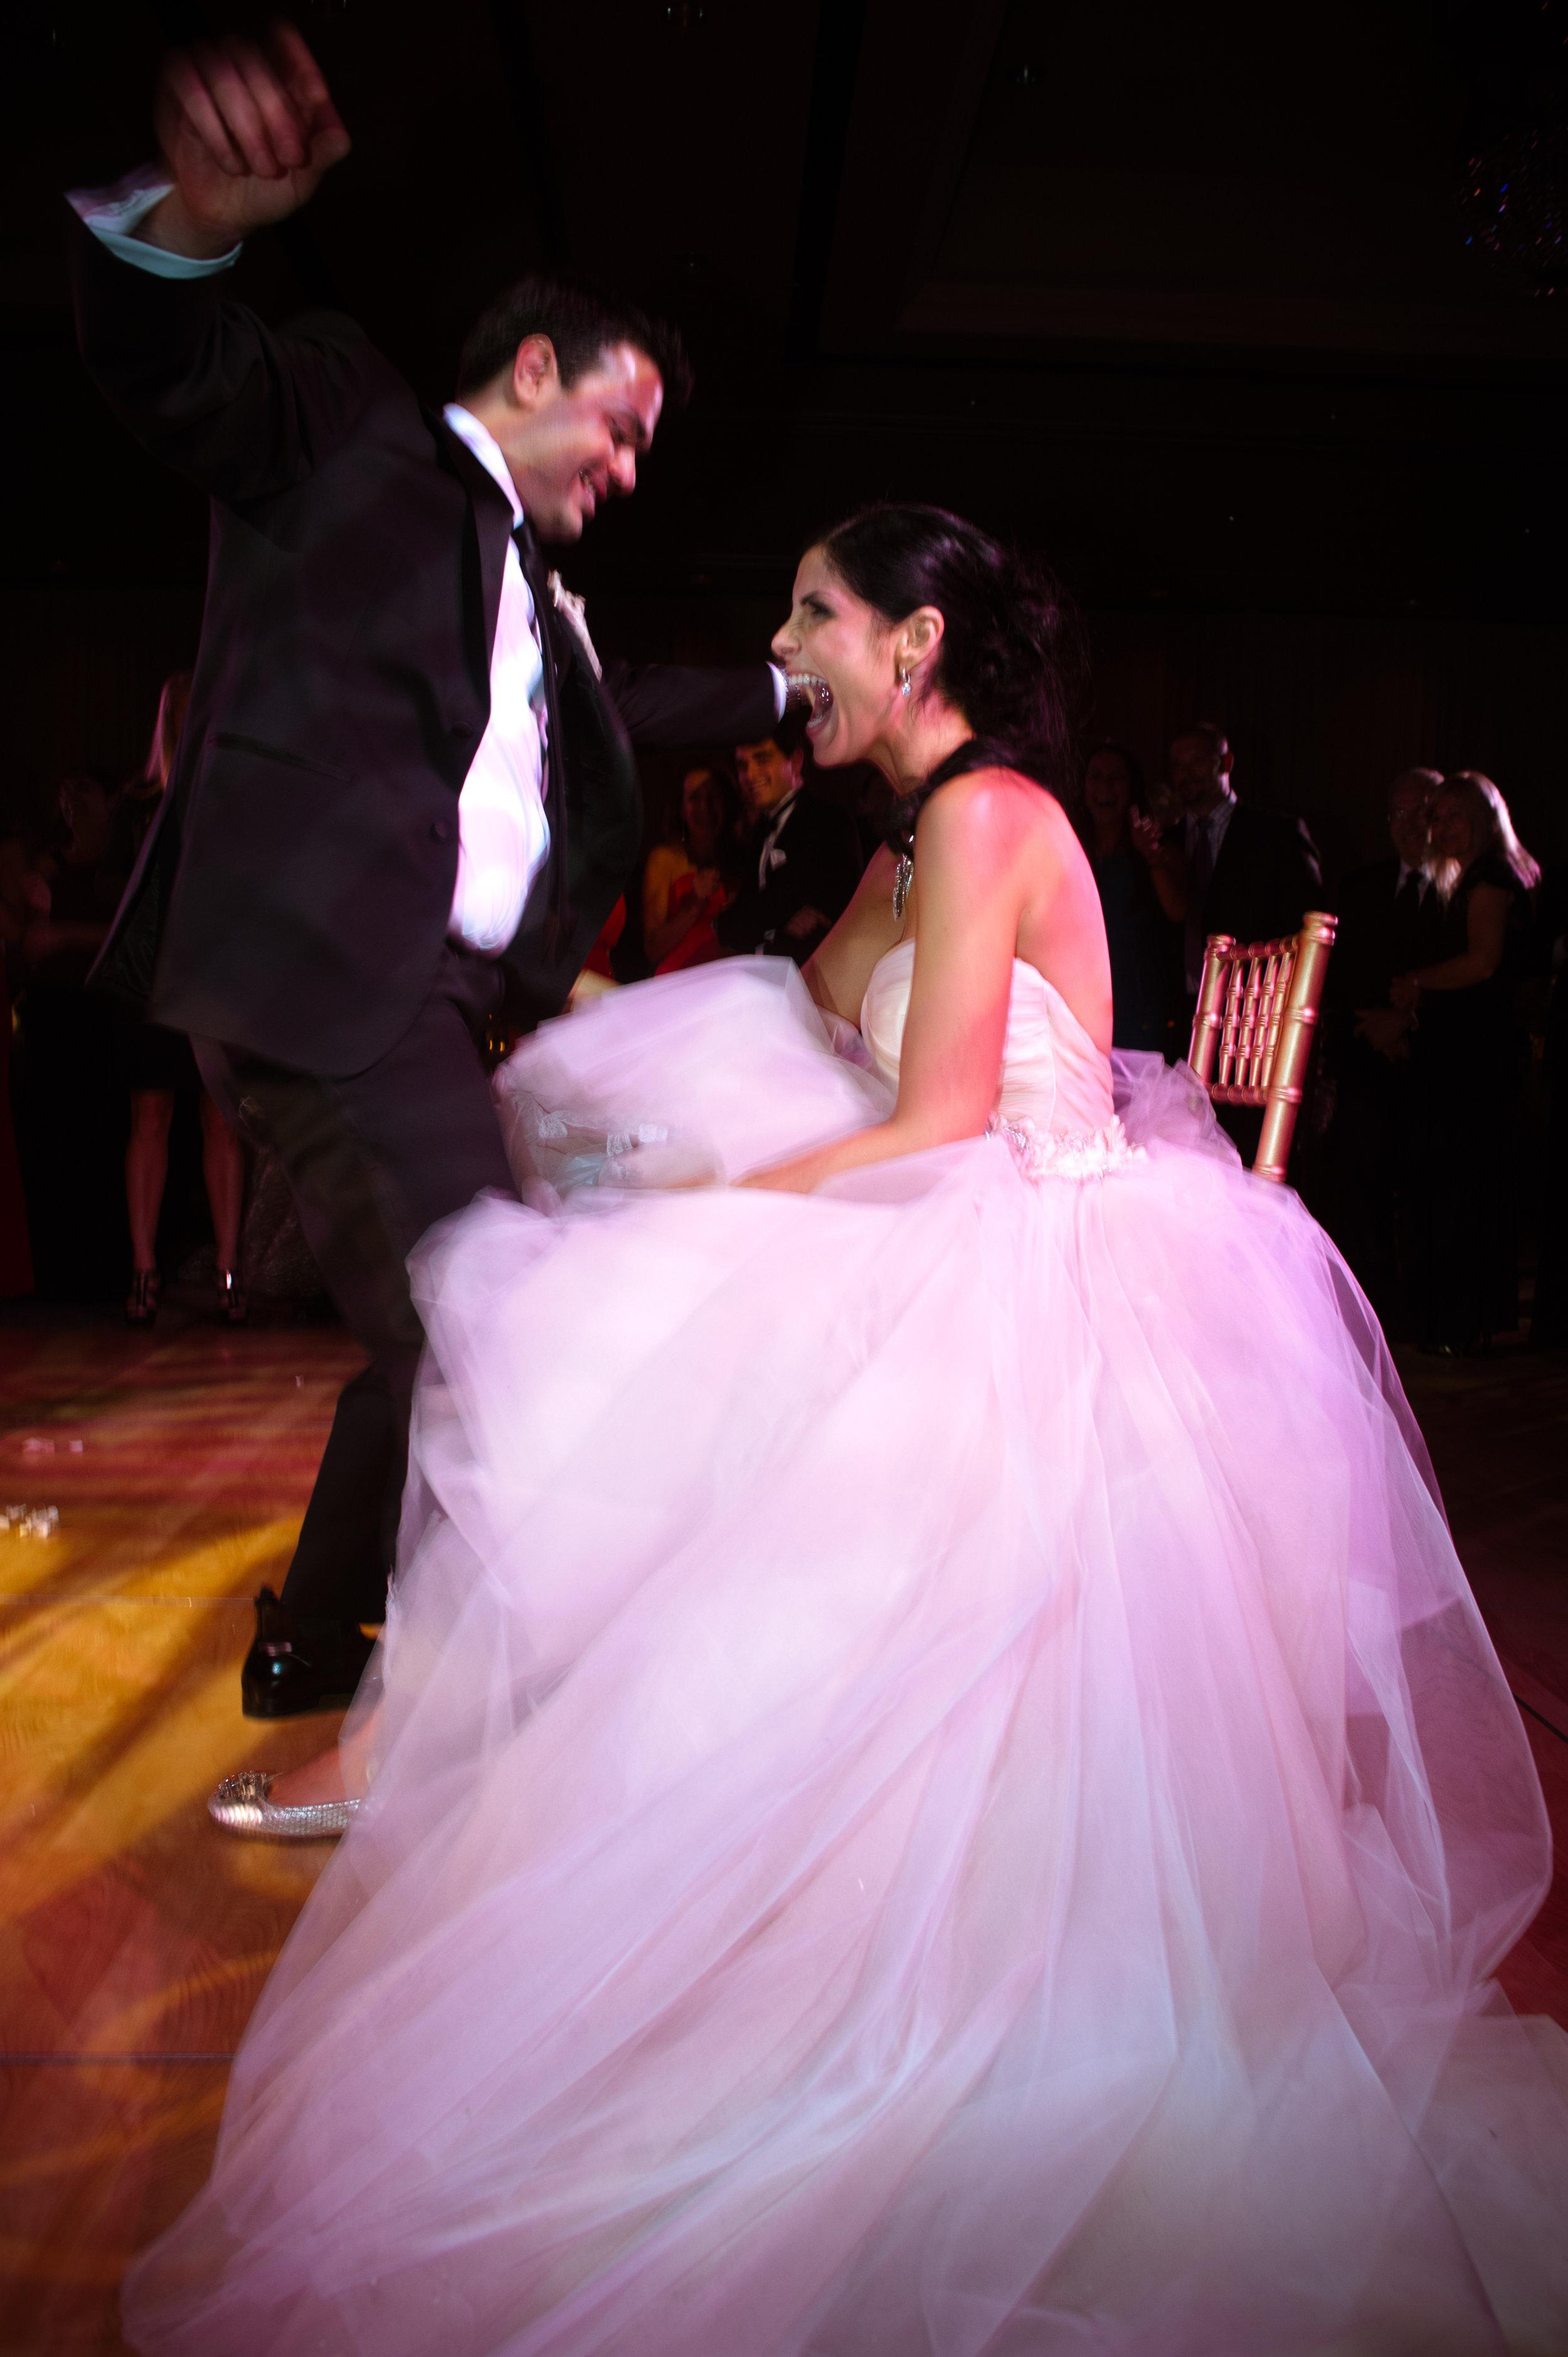 49 garter removal groom removing brides garter traditional wedding Christine Johnson Photography Life Design Events.jpg